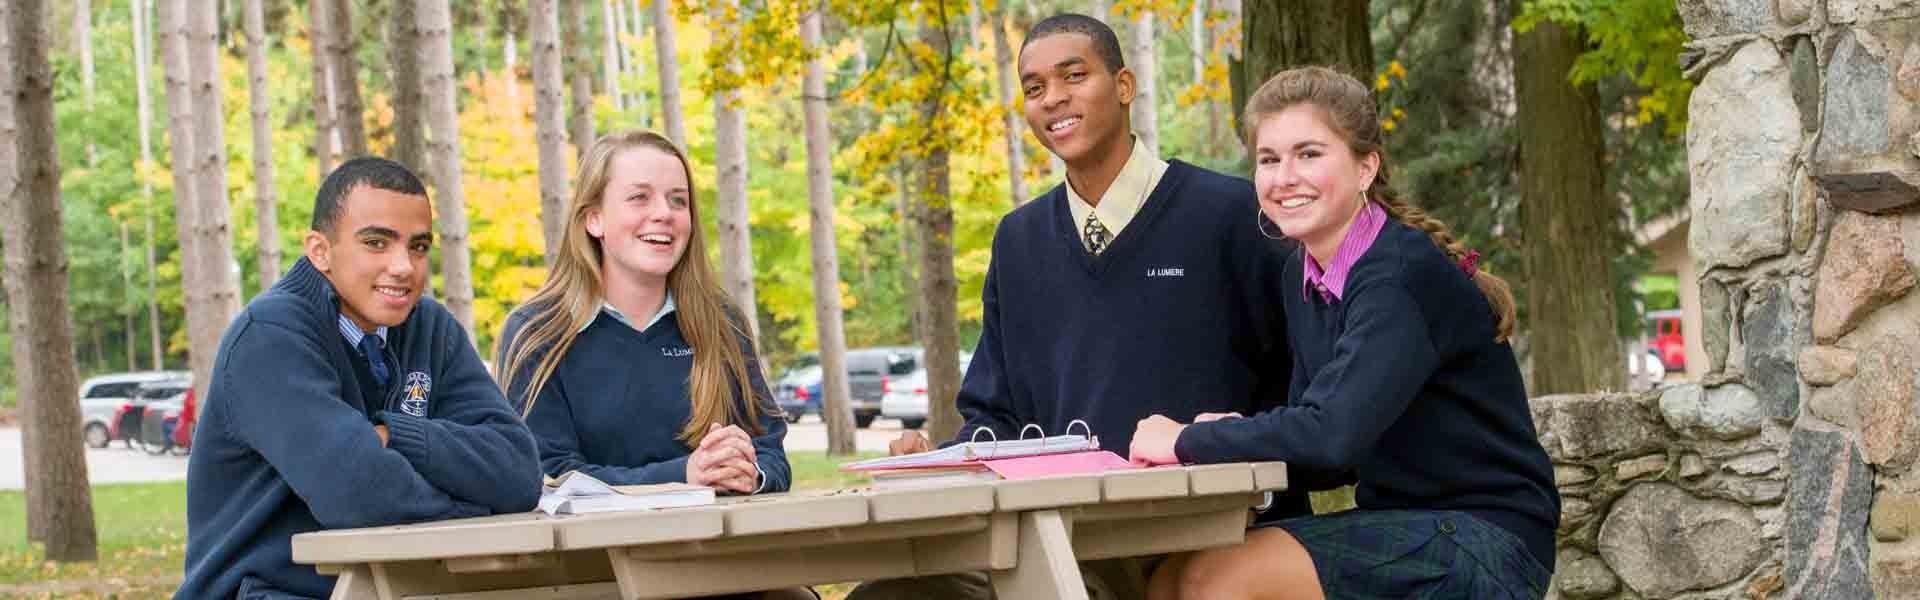 LalumiereSchool-Highschool-Indiana-Outside-MAin-BAnner-2019